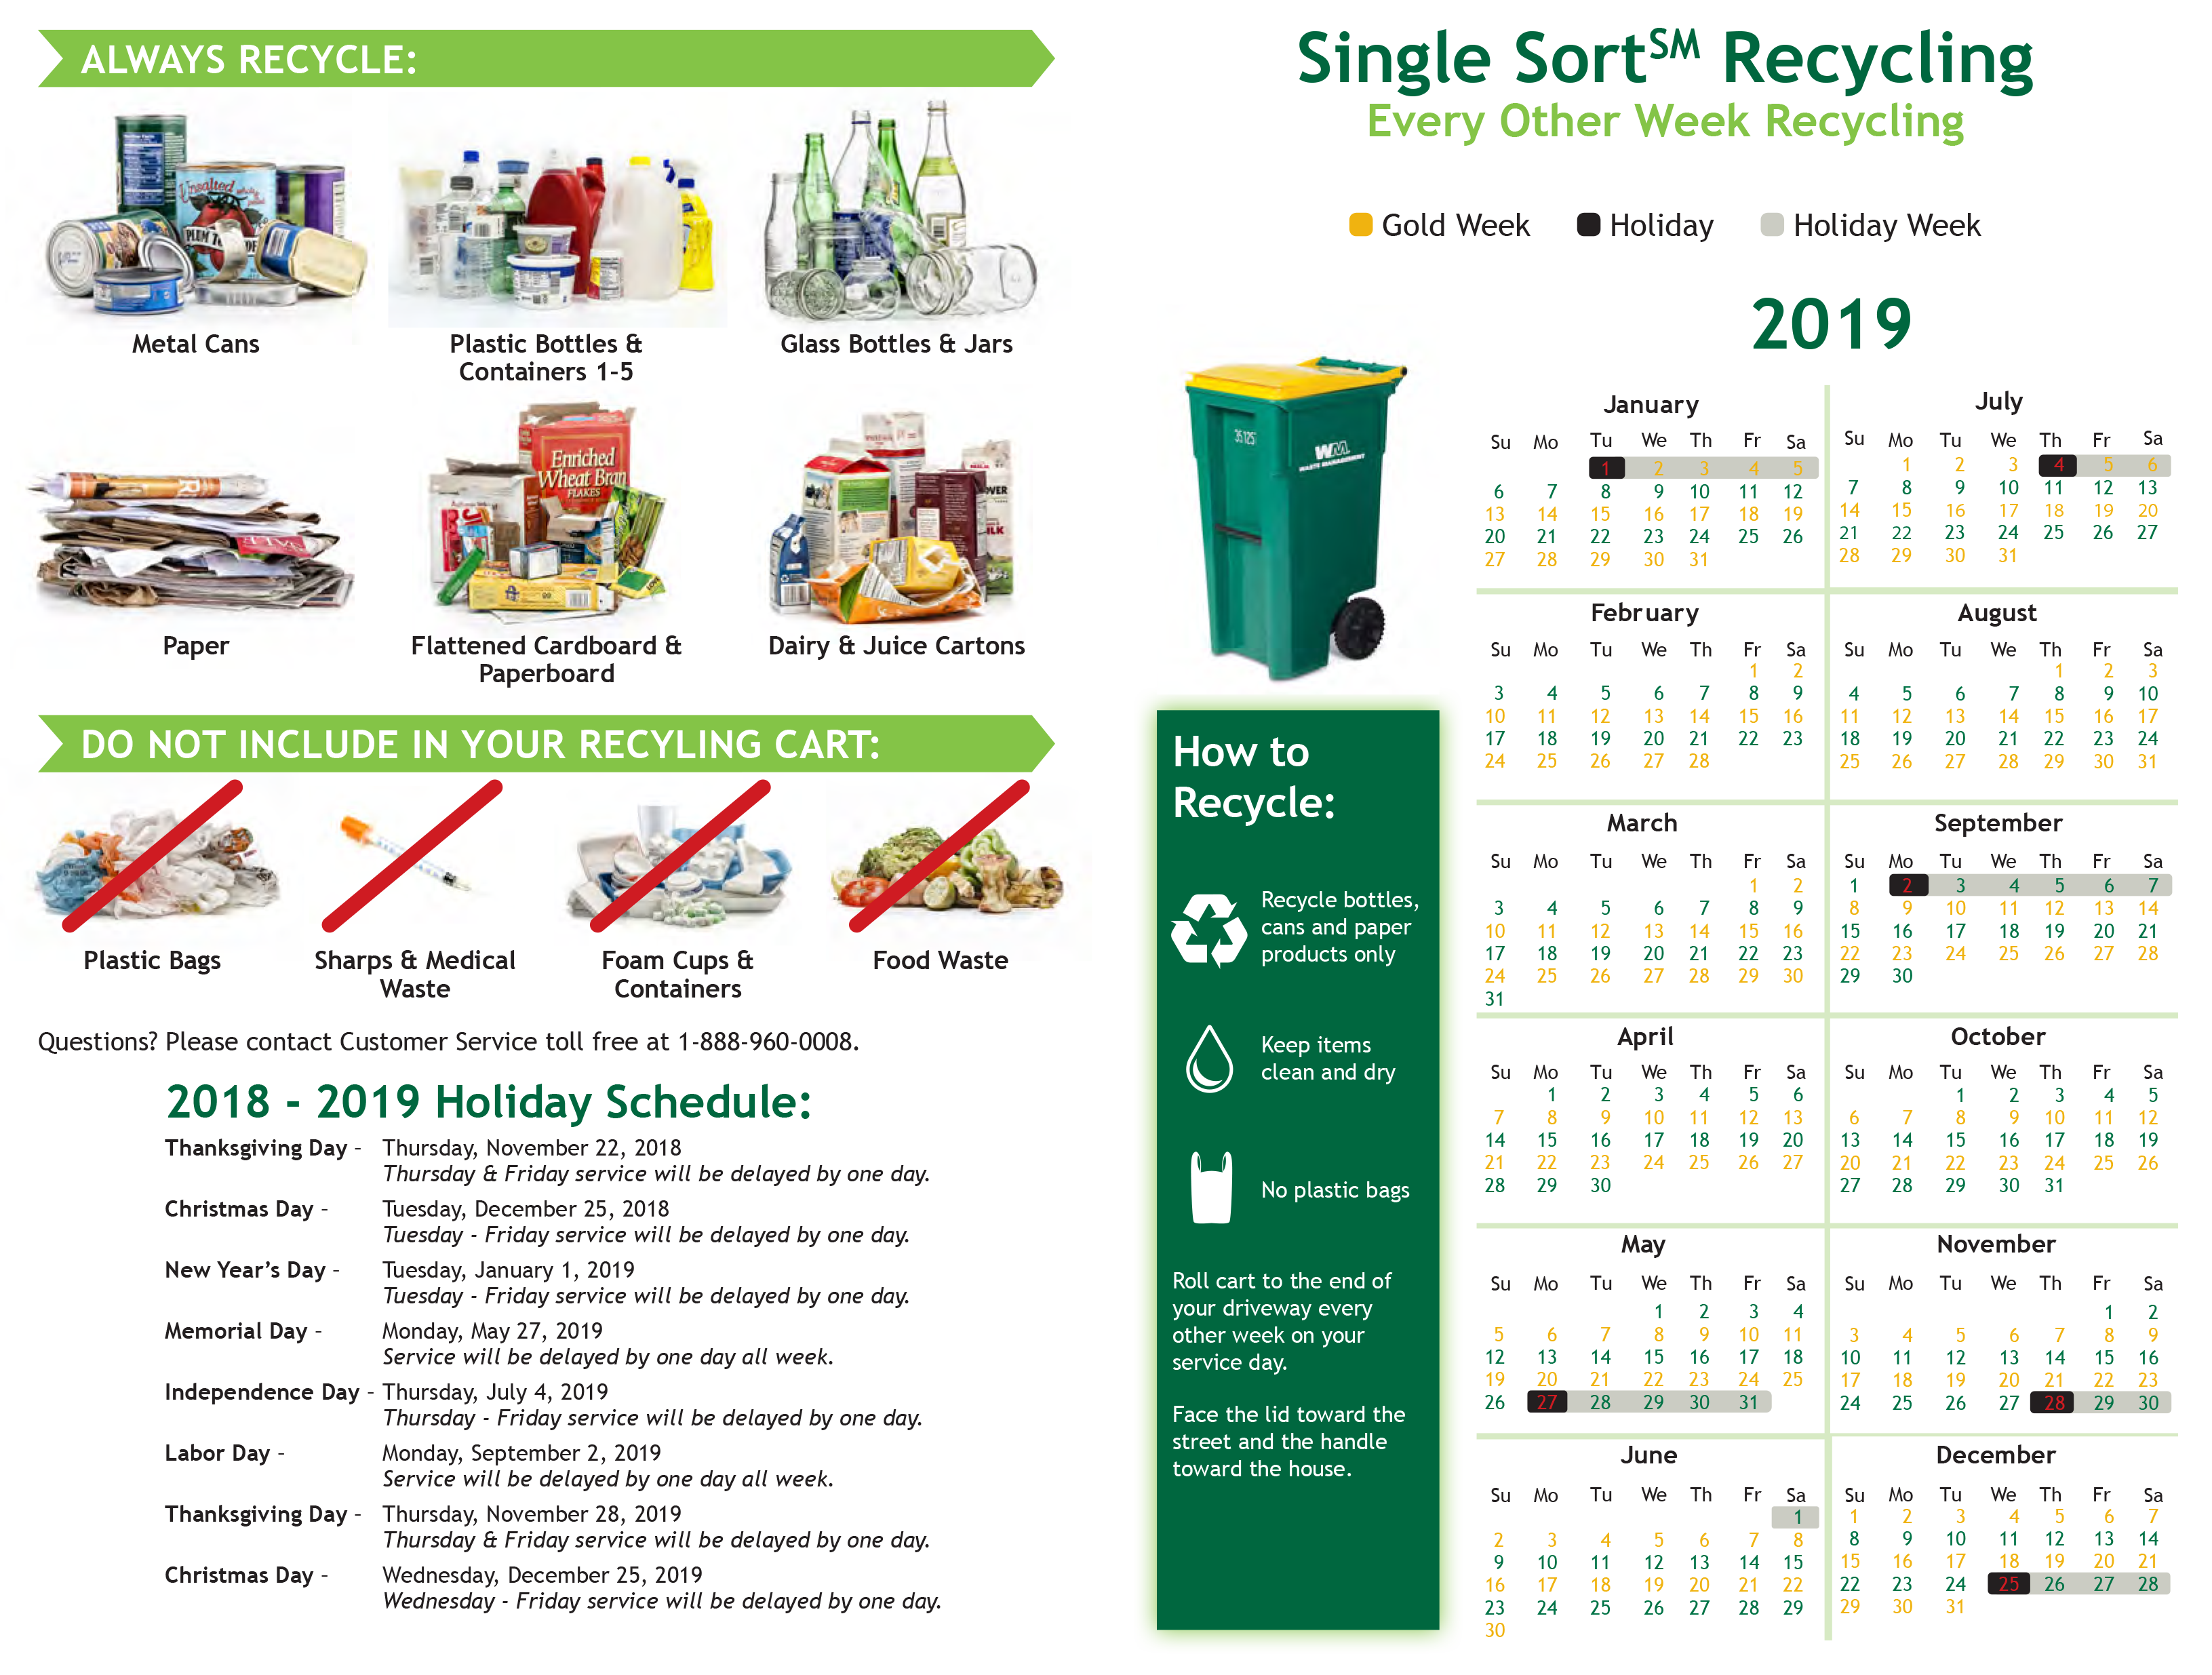 2019 Recycling Calendar